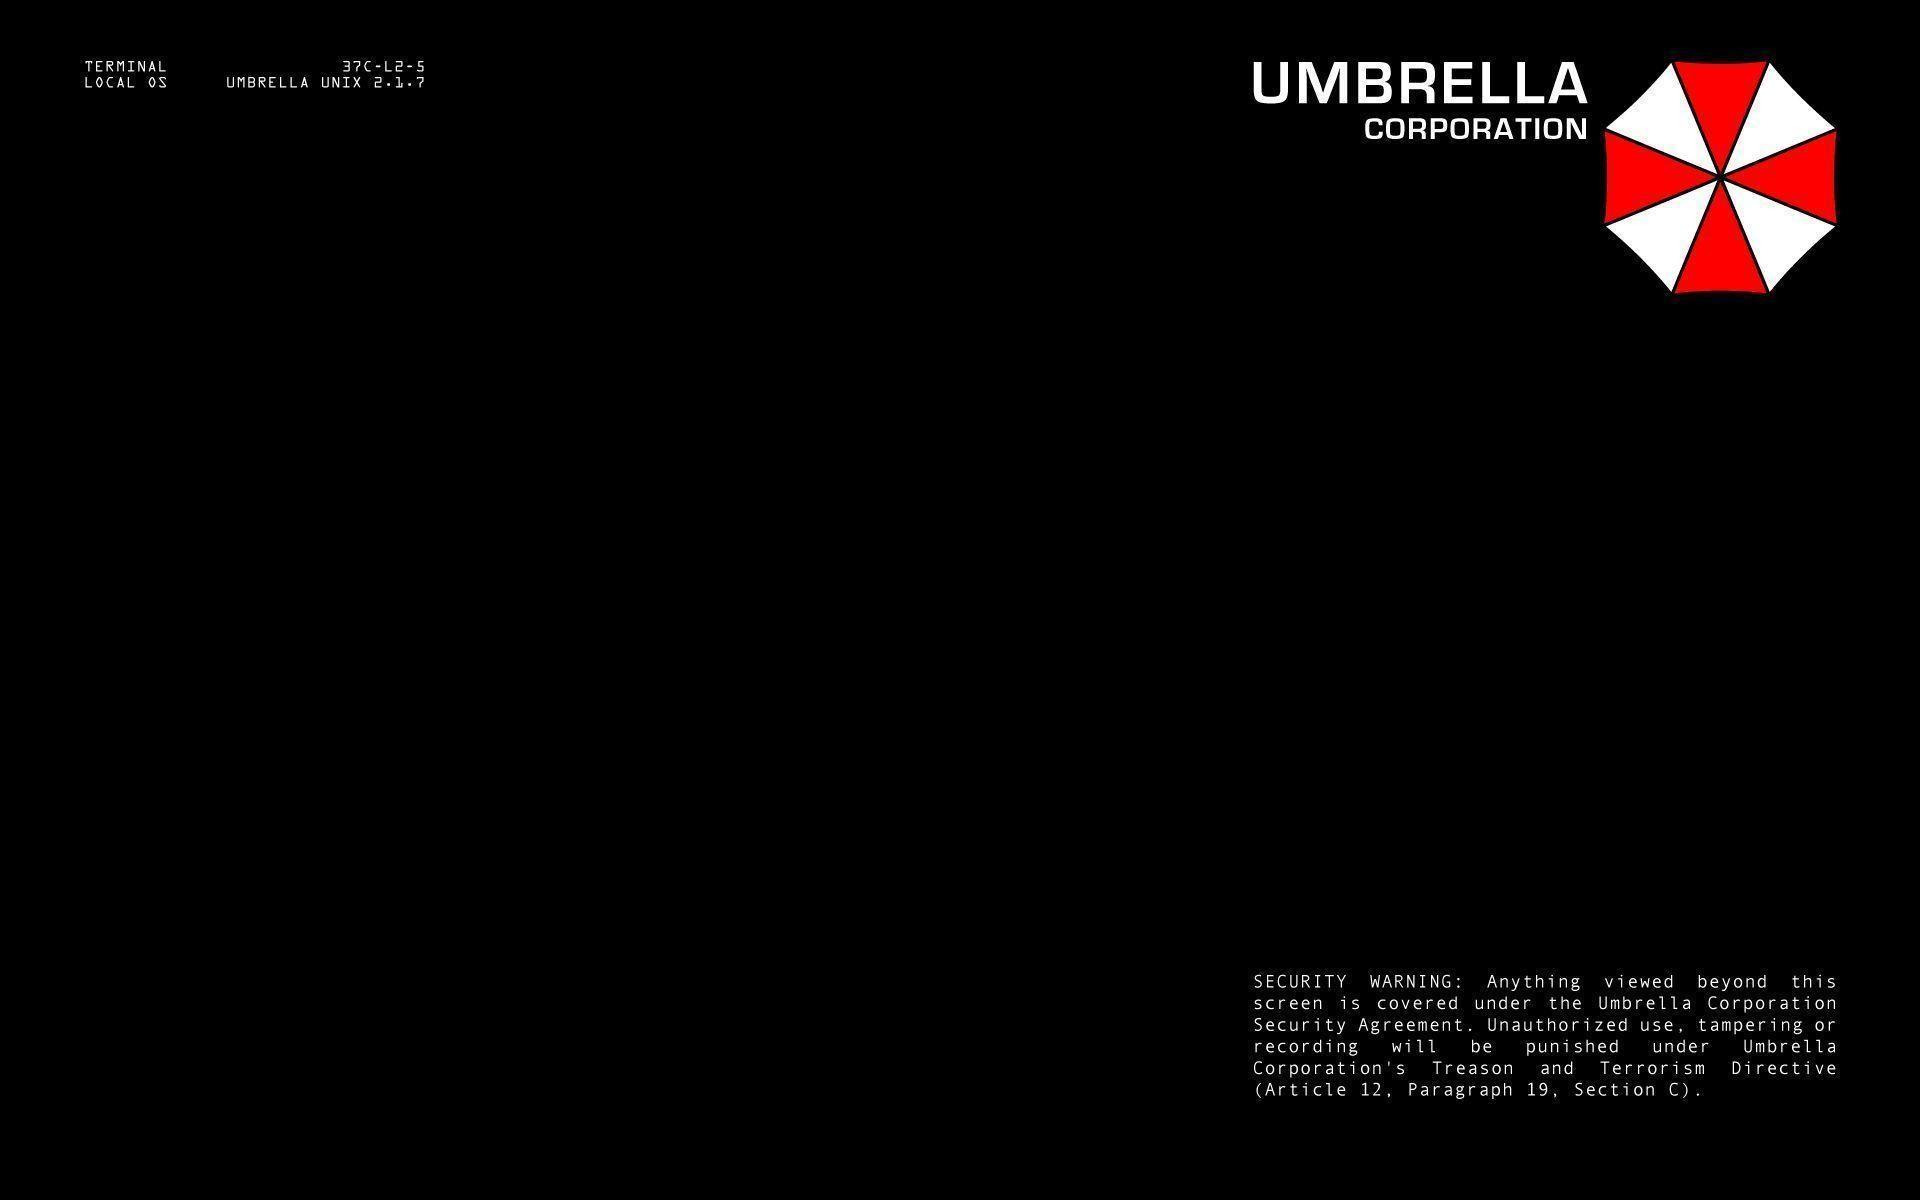 Umbrella Corporation terminal login : Desktop and mobile wallpaper .